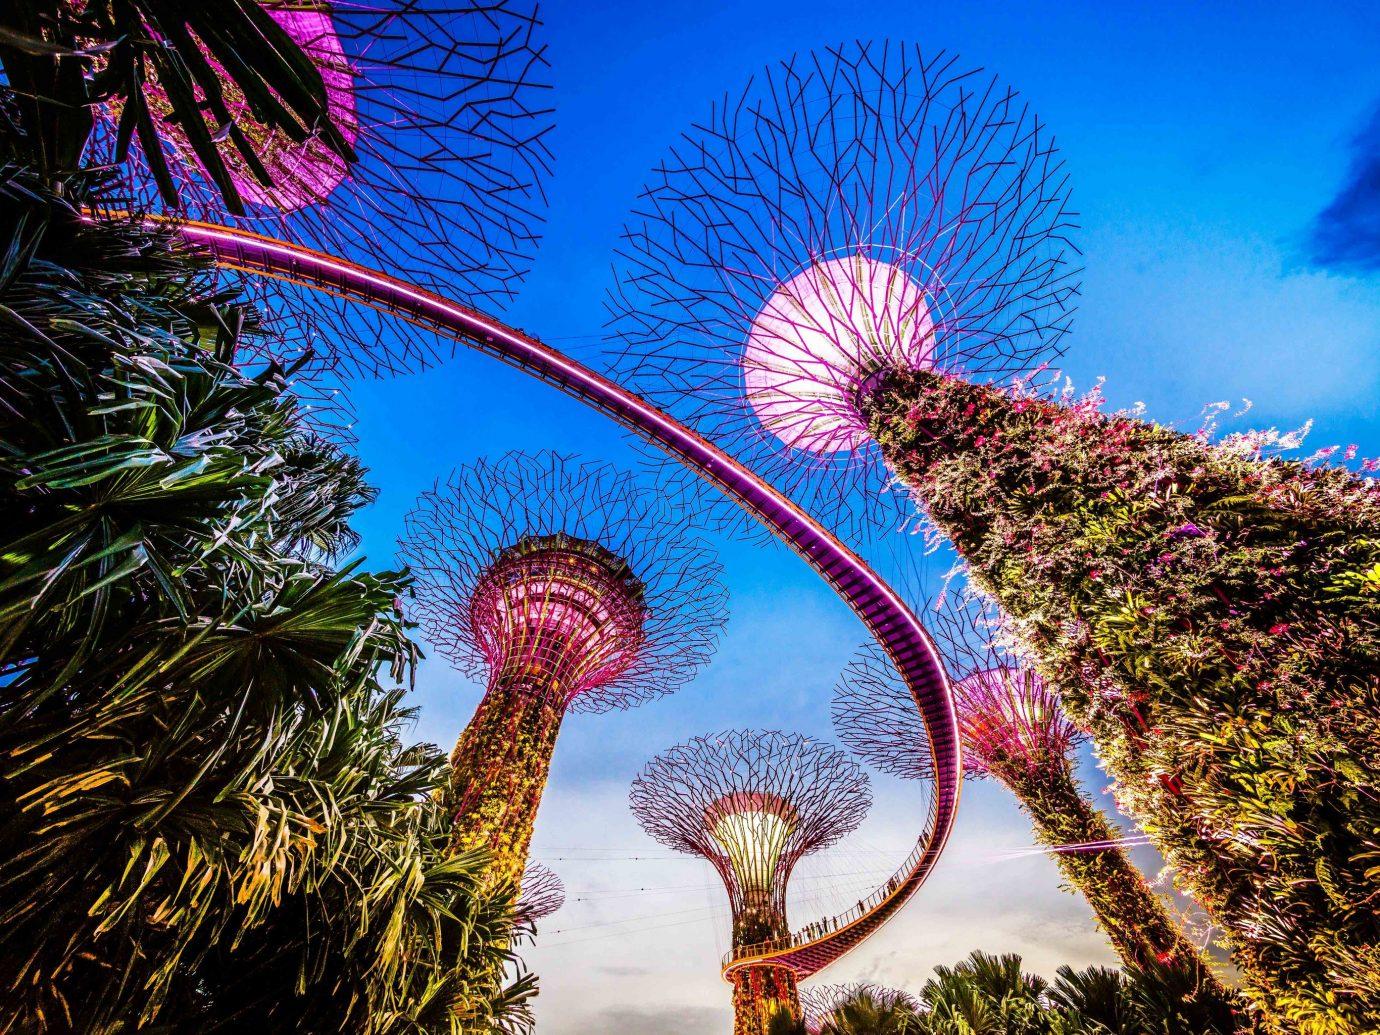 Offbeat Singapore Trip Ideas sky Nature woody plant tree tourist attraction palm tree arecales plant leaf amusement park computer wallpaper tourism world tropics festival date palm City